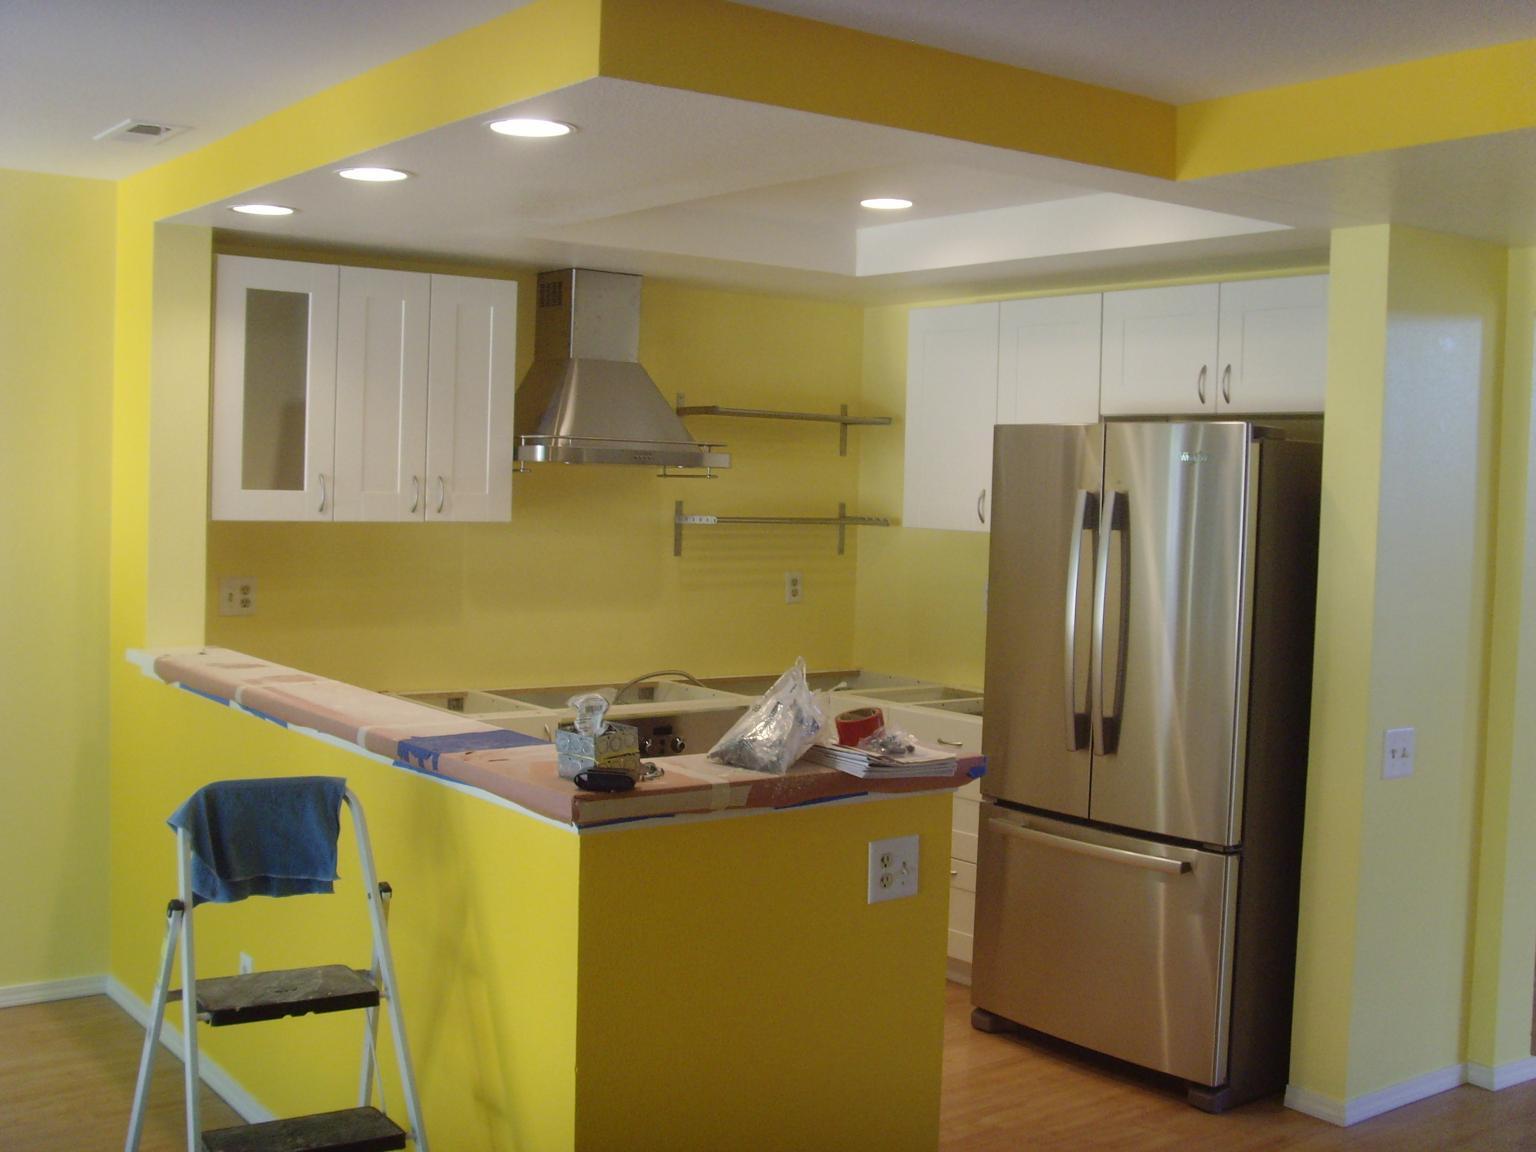 Best Arredare Piccola Cucina Pictures - Ridgewayng.com - ridgewayng.com